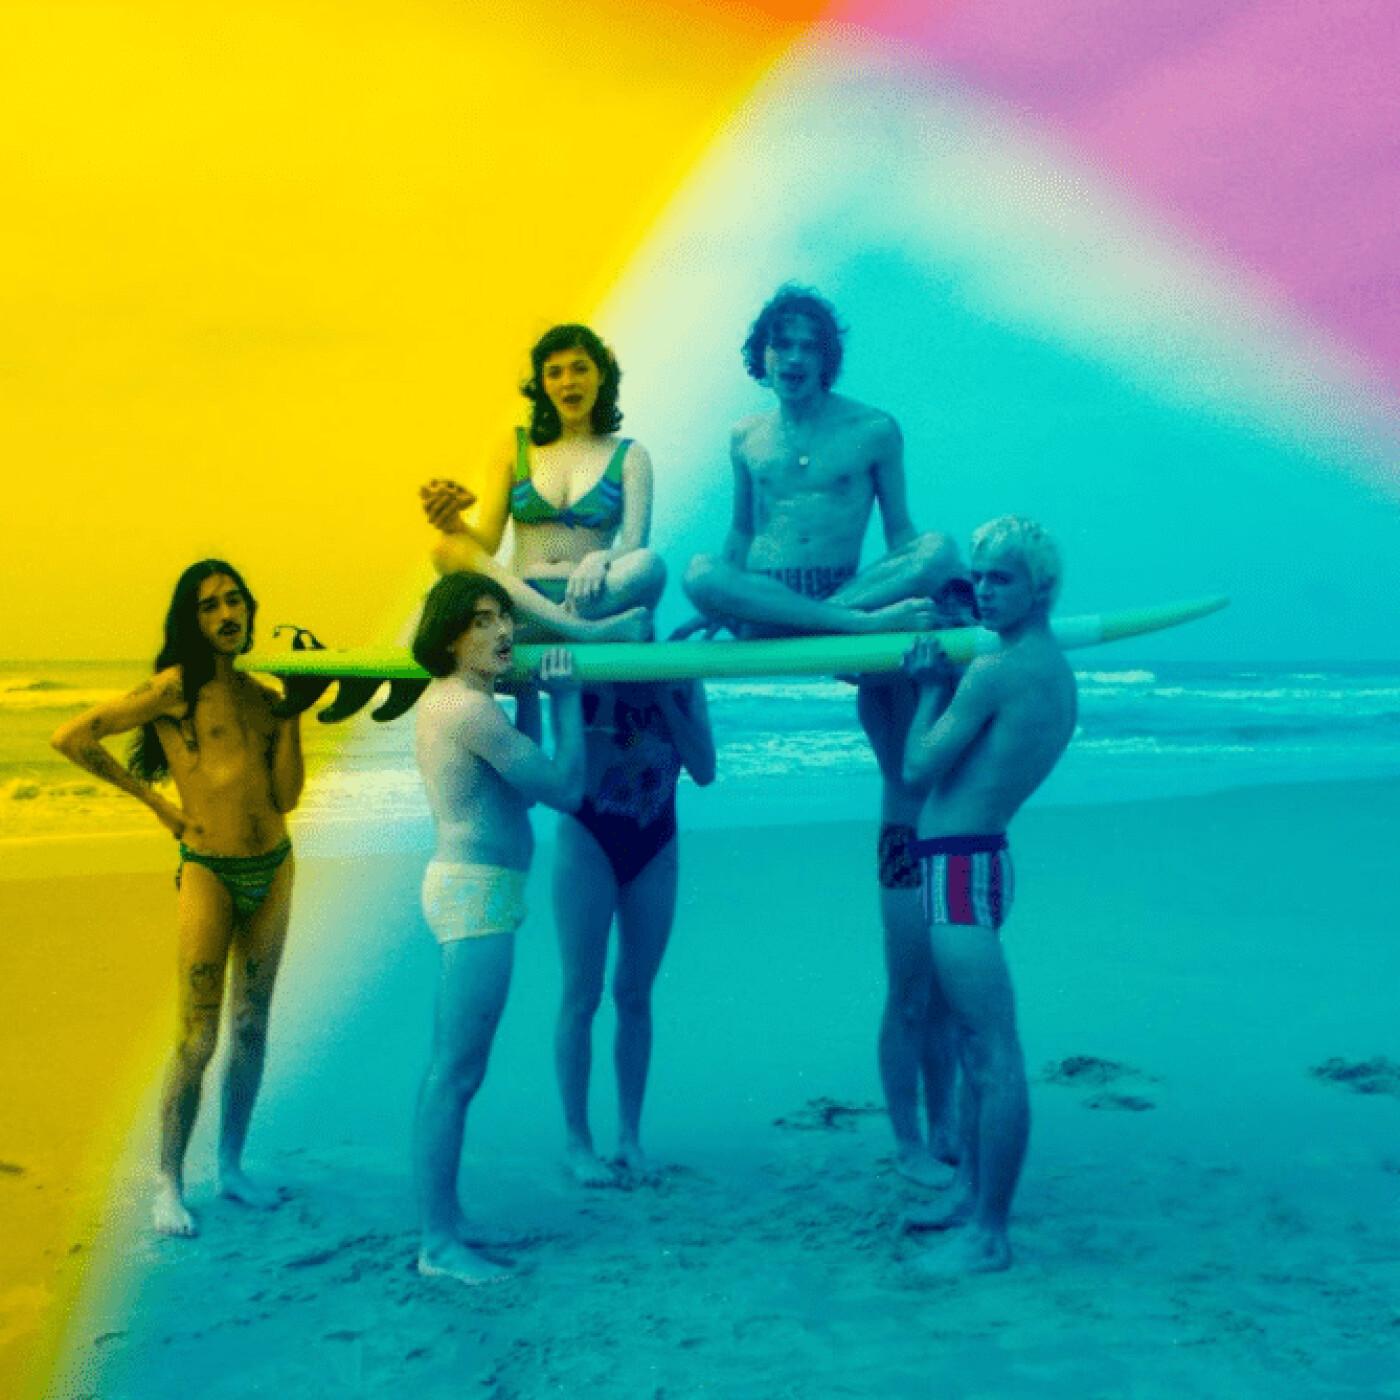 Artistes du jour, découvrez Klon avec Santa Barbara - 15 04 21 - StereoChic Radio